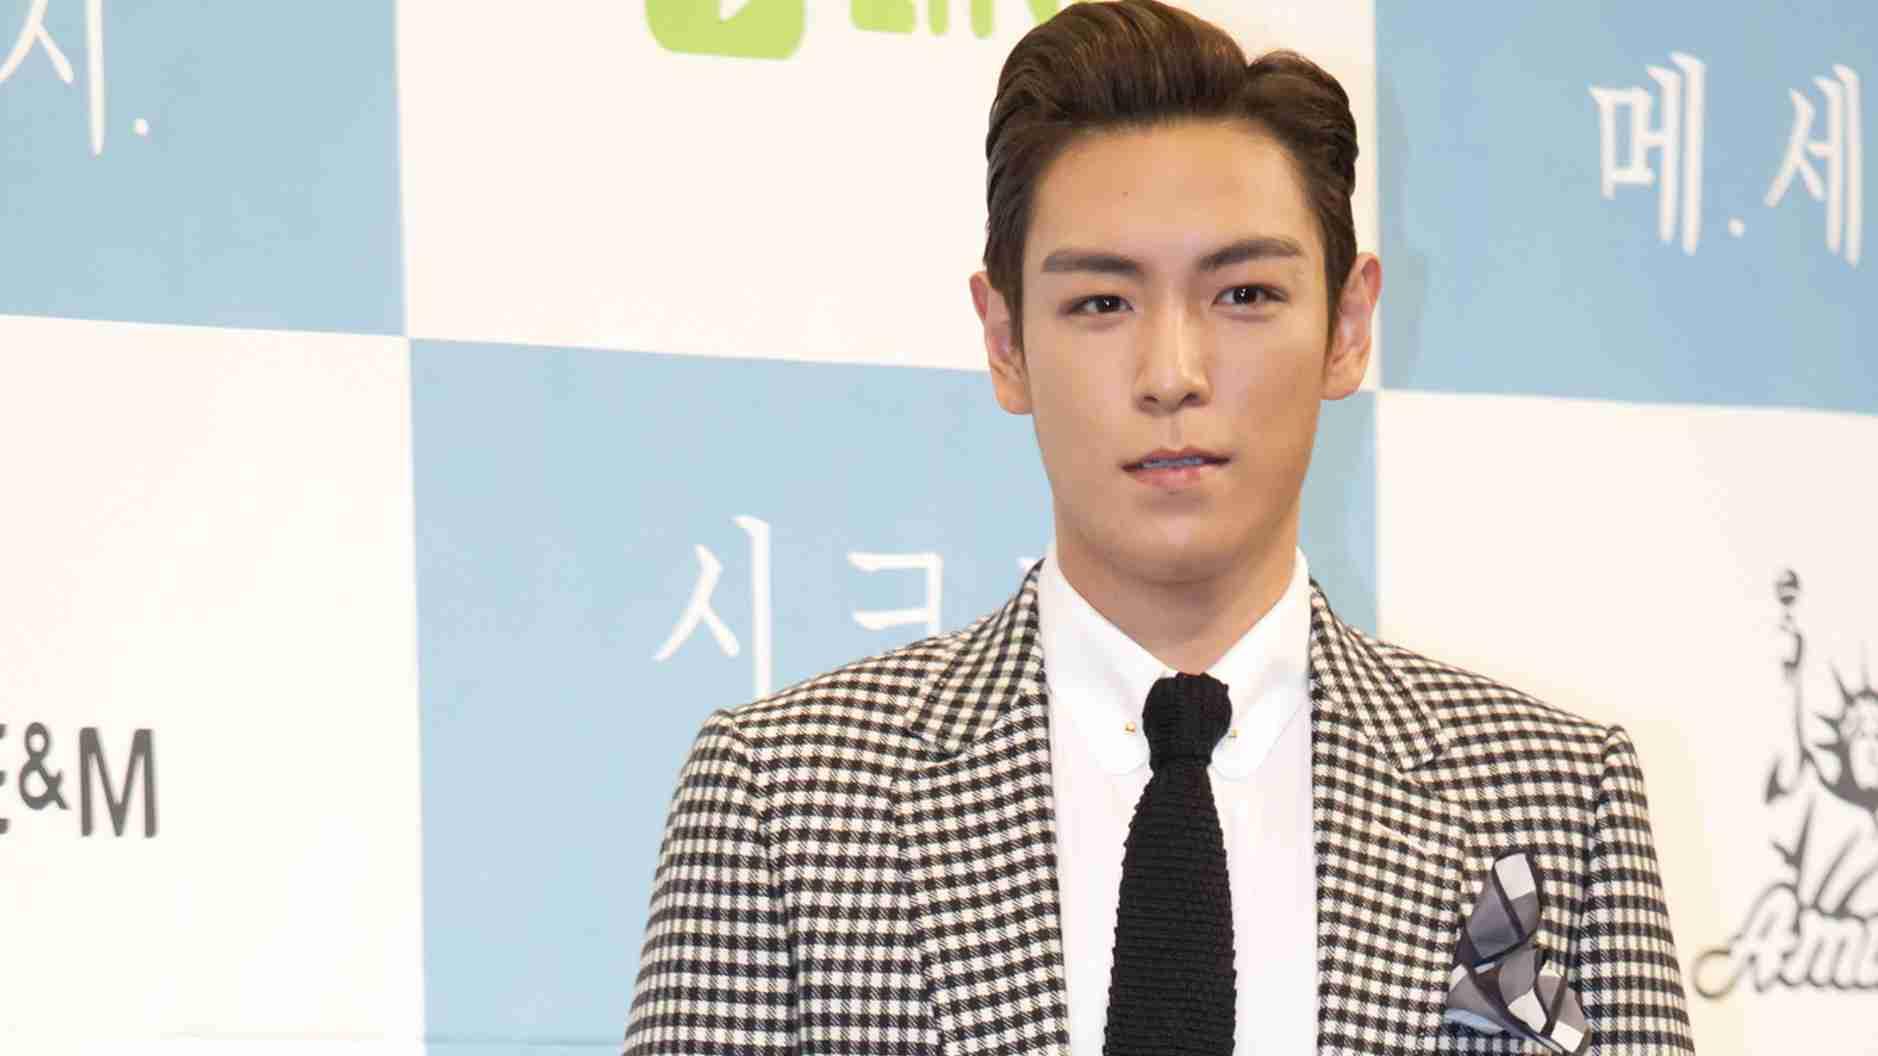 "BIGBANGのT.O.Pに大麻吸引容疑。""芸能人の兵役""にもたらす余波とは?(慎武宏) - 個人 - Yahoo!ニュース"